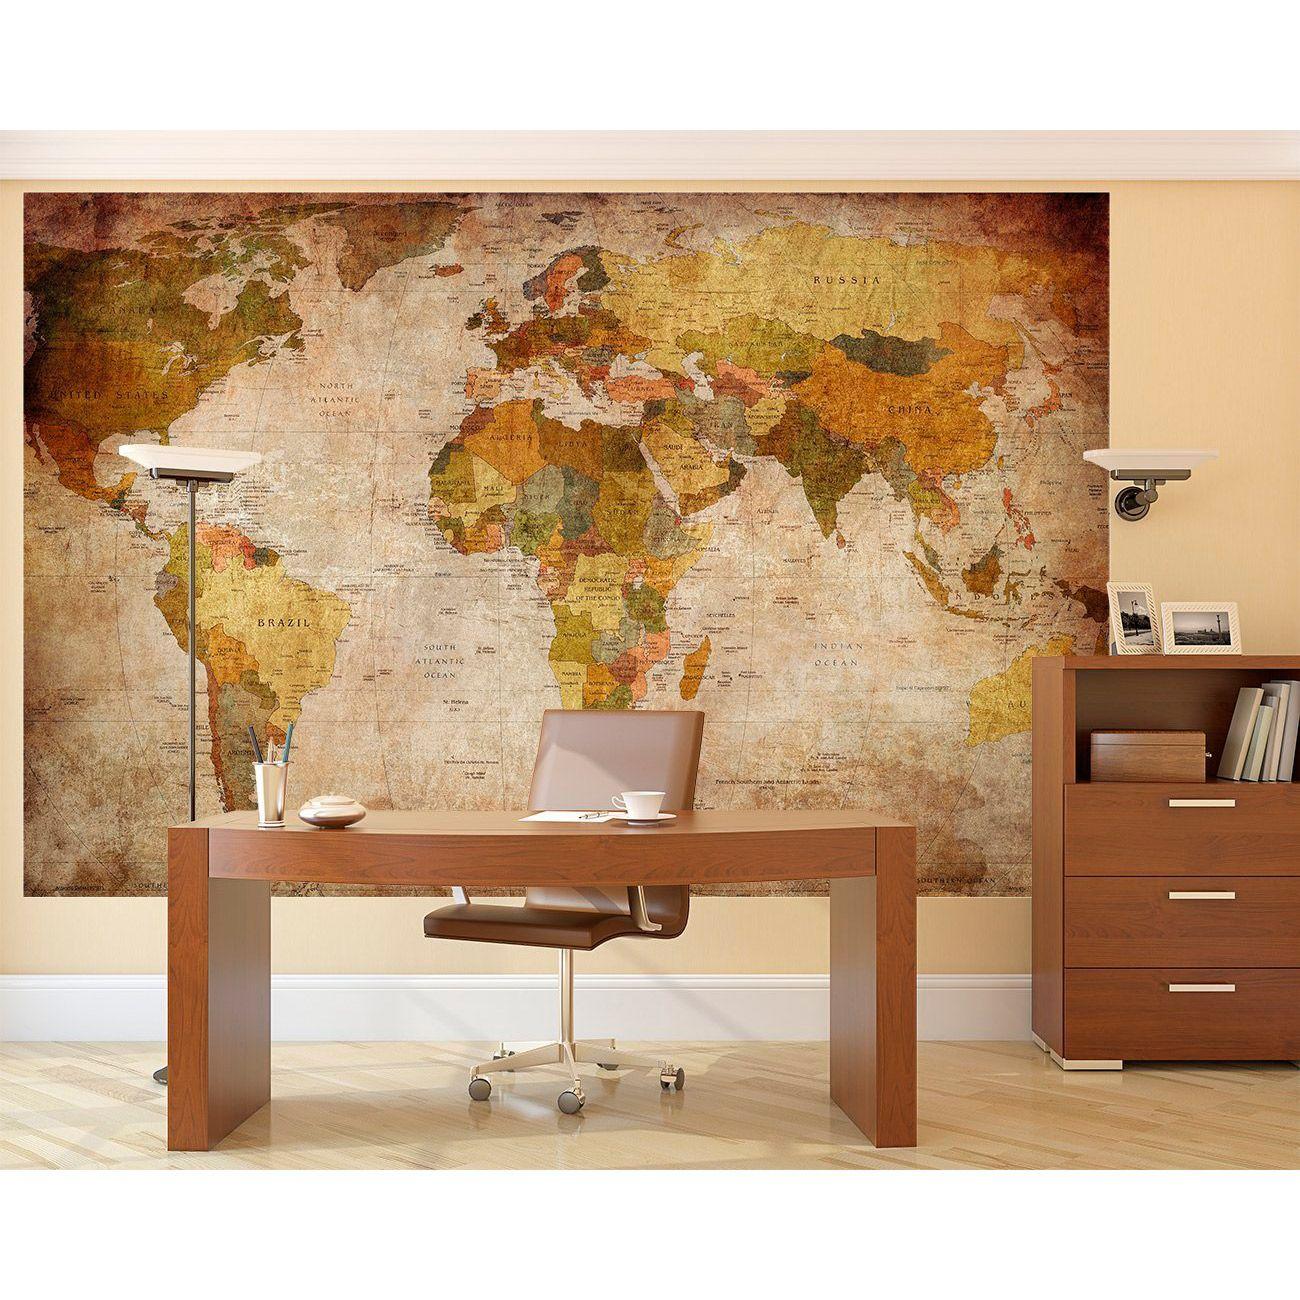 Mapa mundi murales decorativos y educativos - Papel pintado mapamundi ...